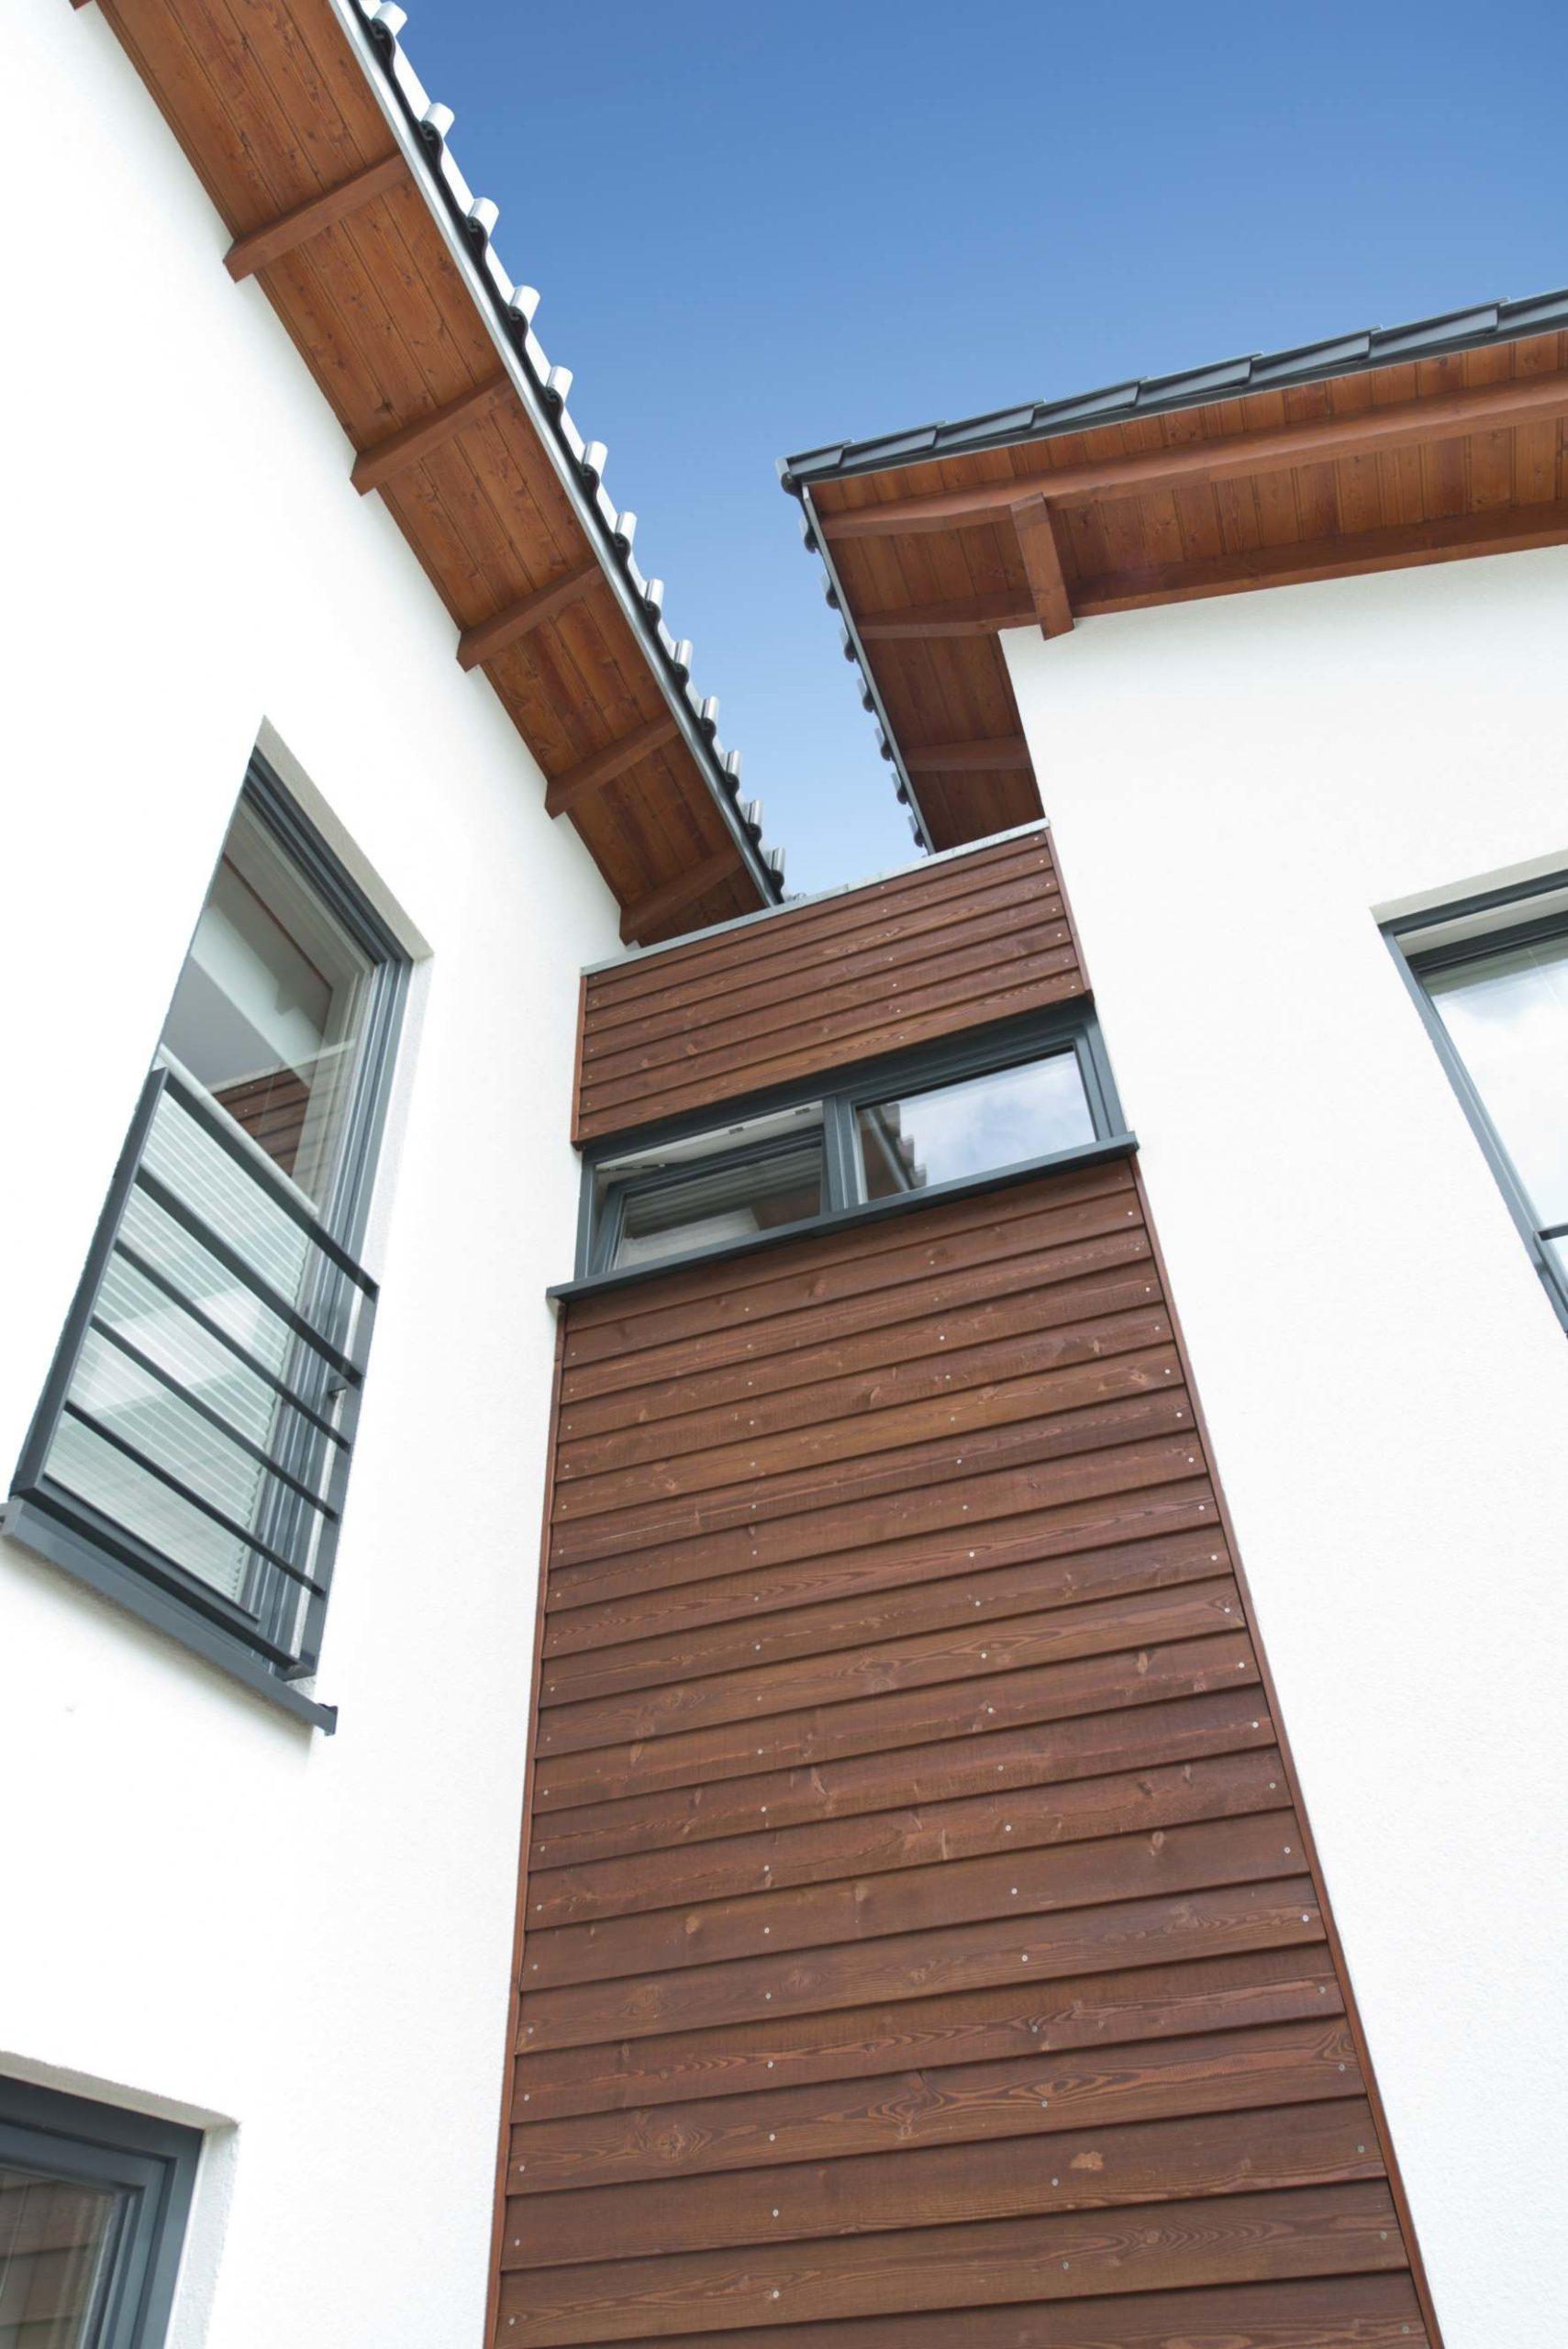 Wohnhaus als Holzhaus, Mehrgenerationenhaus Pultdach, Putzfassade, Holzfassade